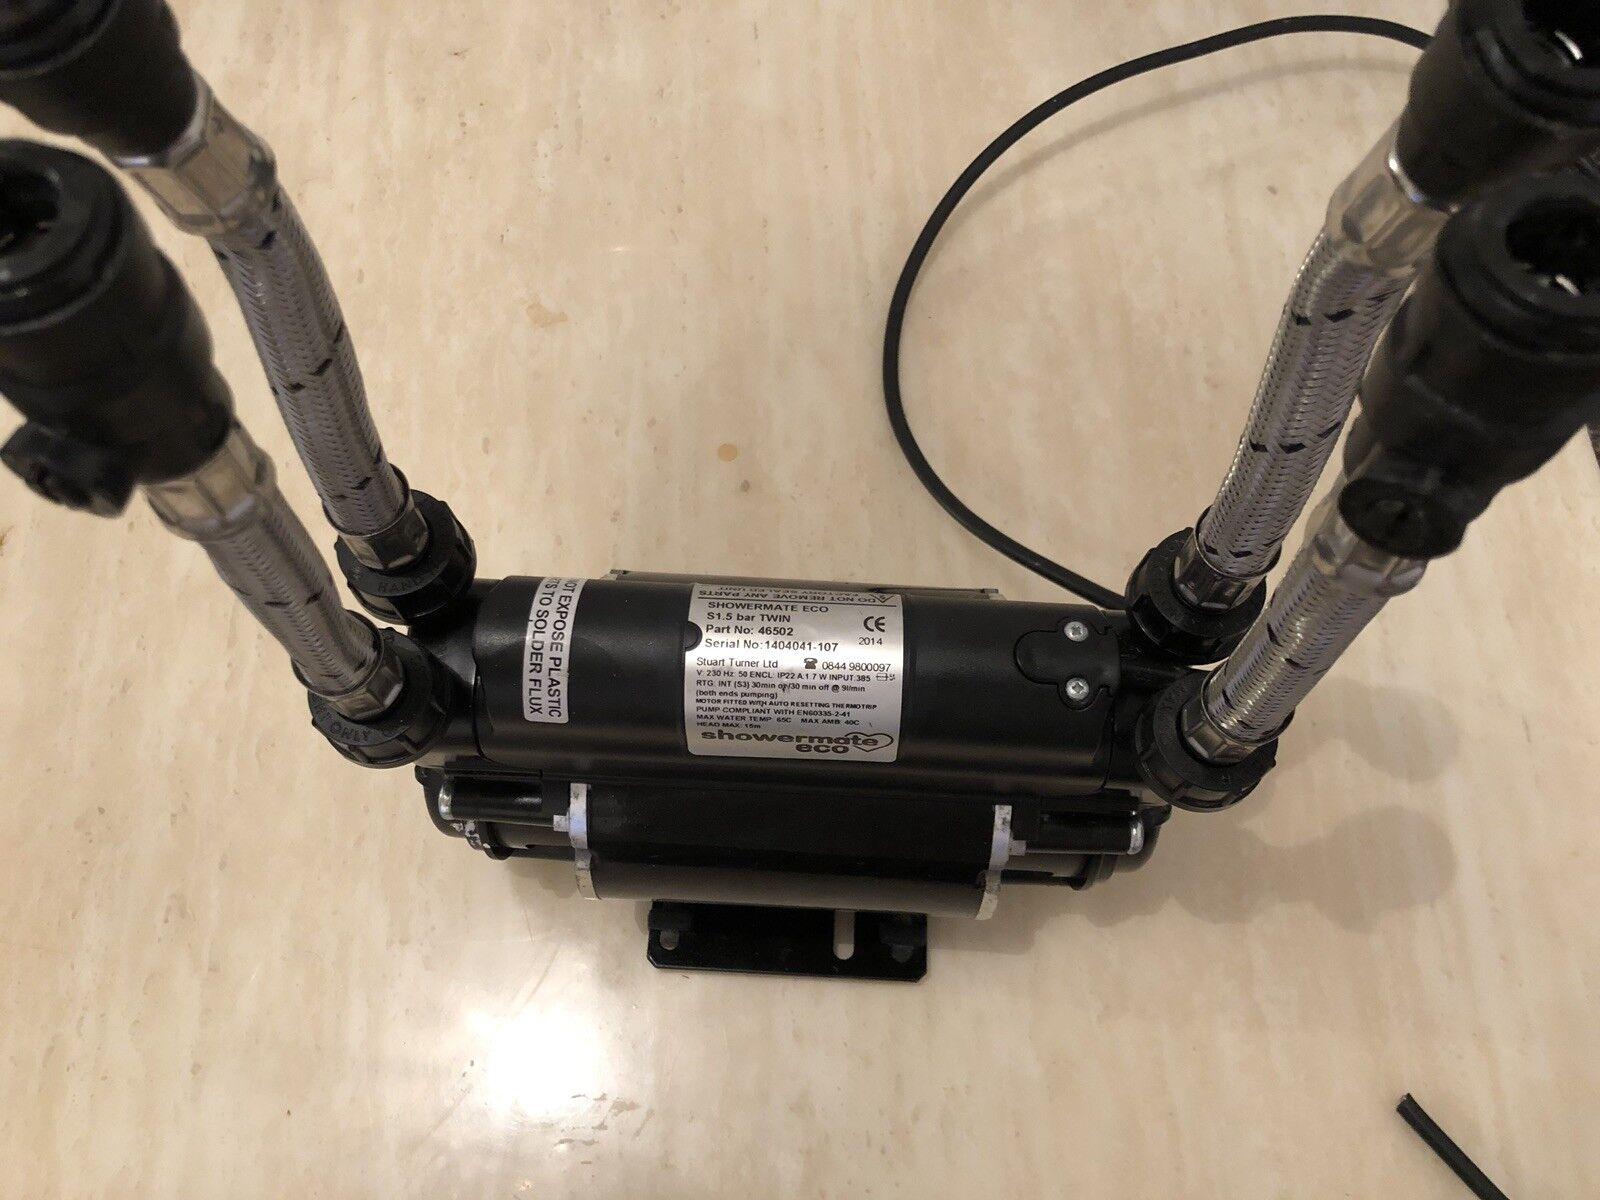 Bomba de ducha Stuart Turner showermate Eco S 1.5 Bar doble positivo